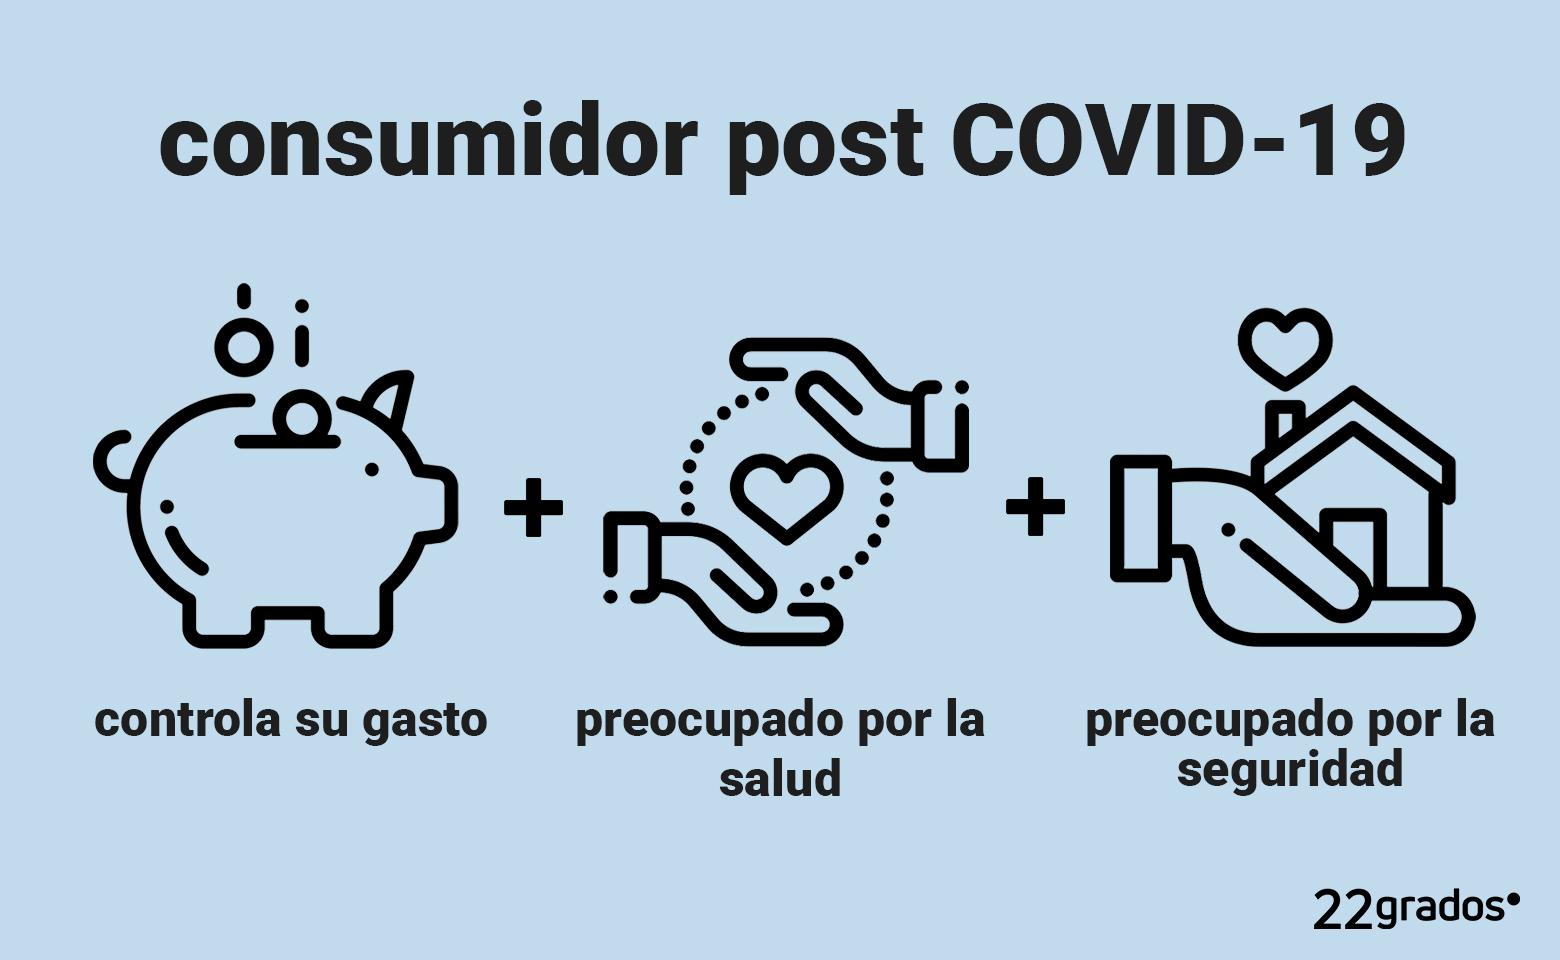 Así es el consumidor post COVID19